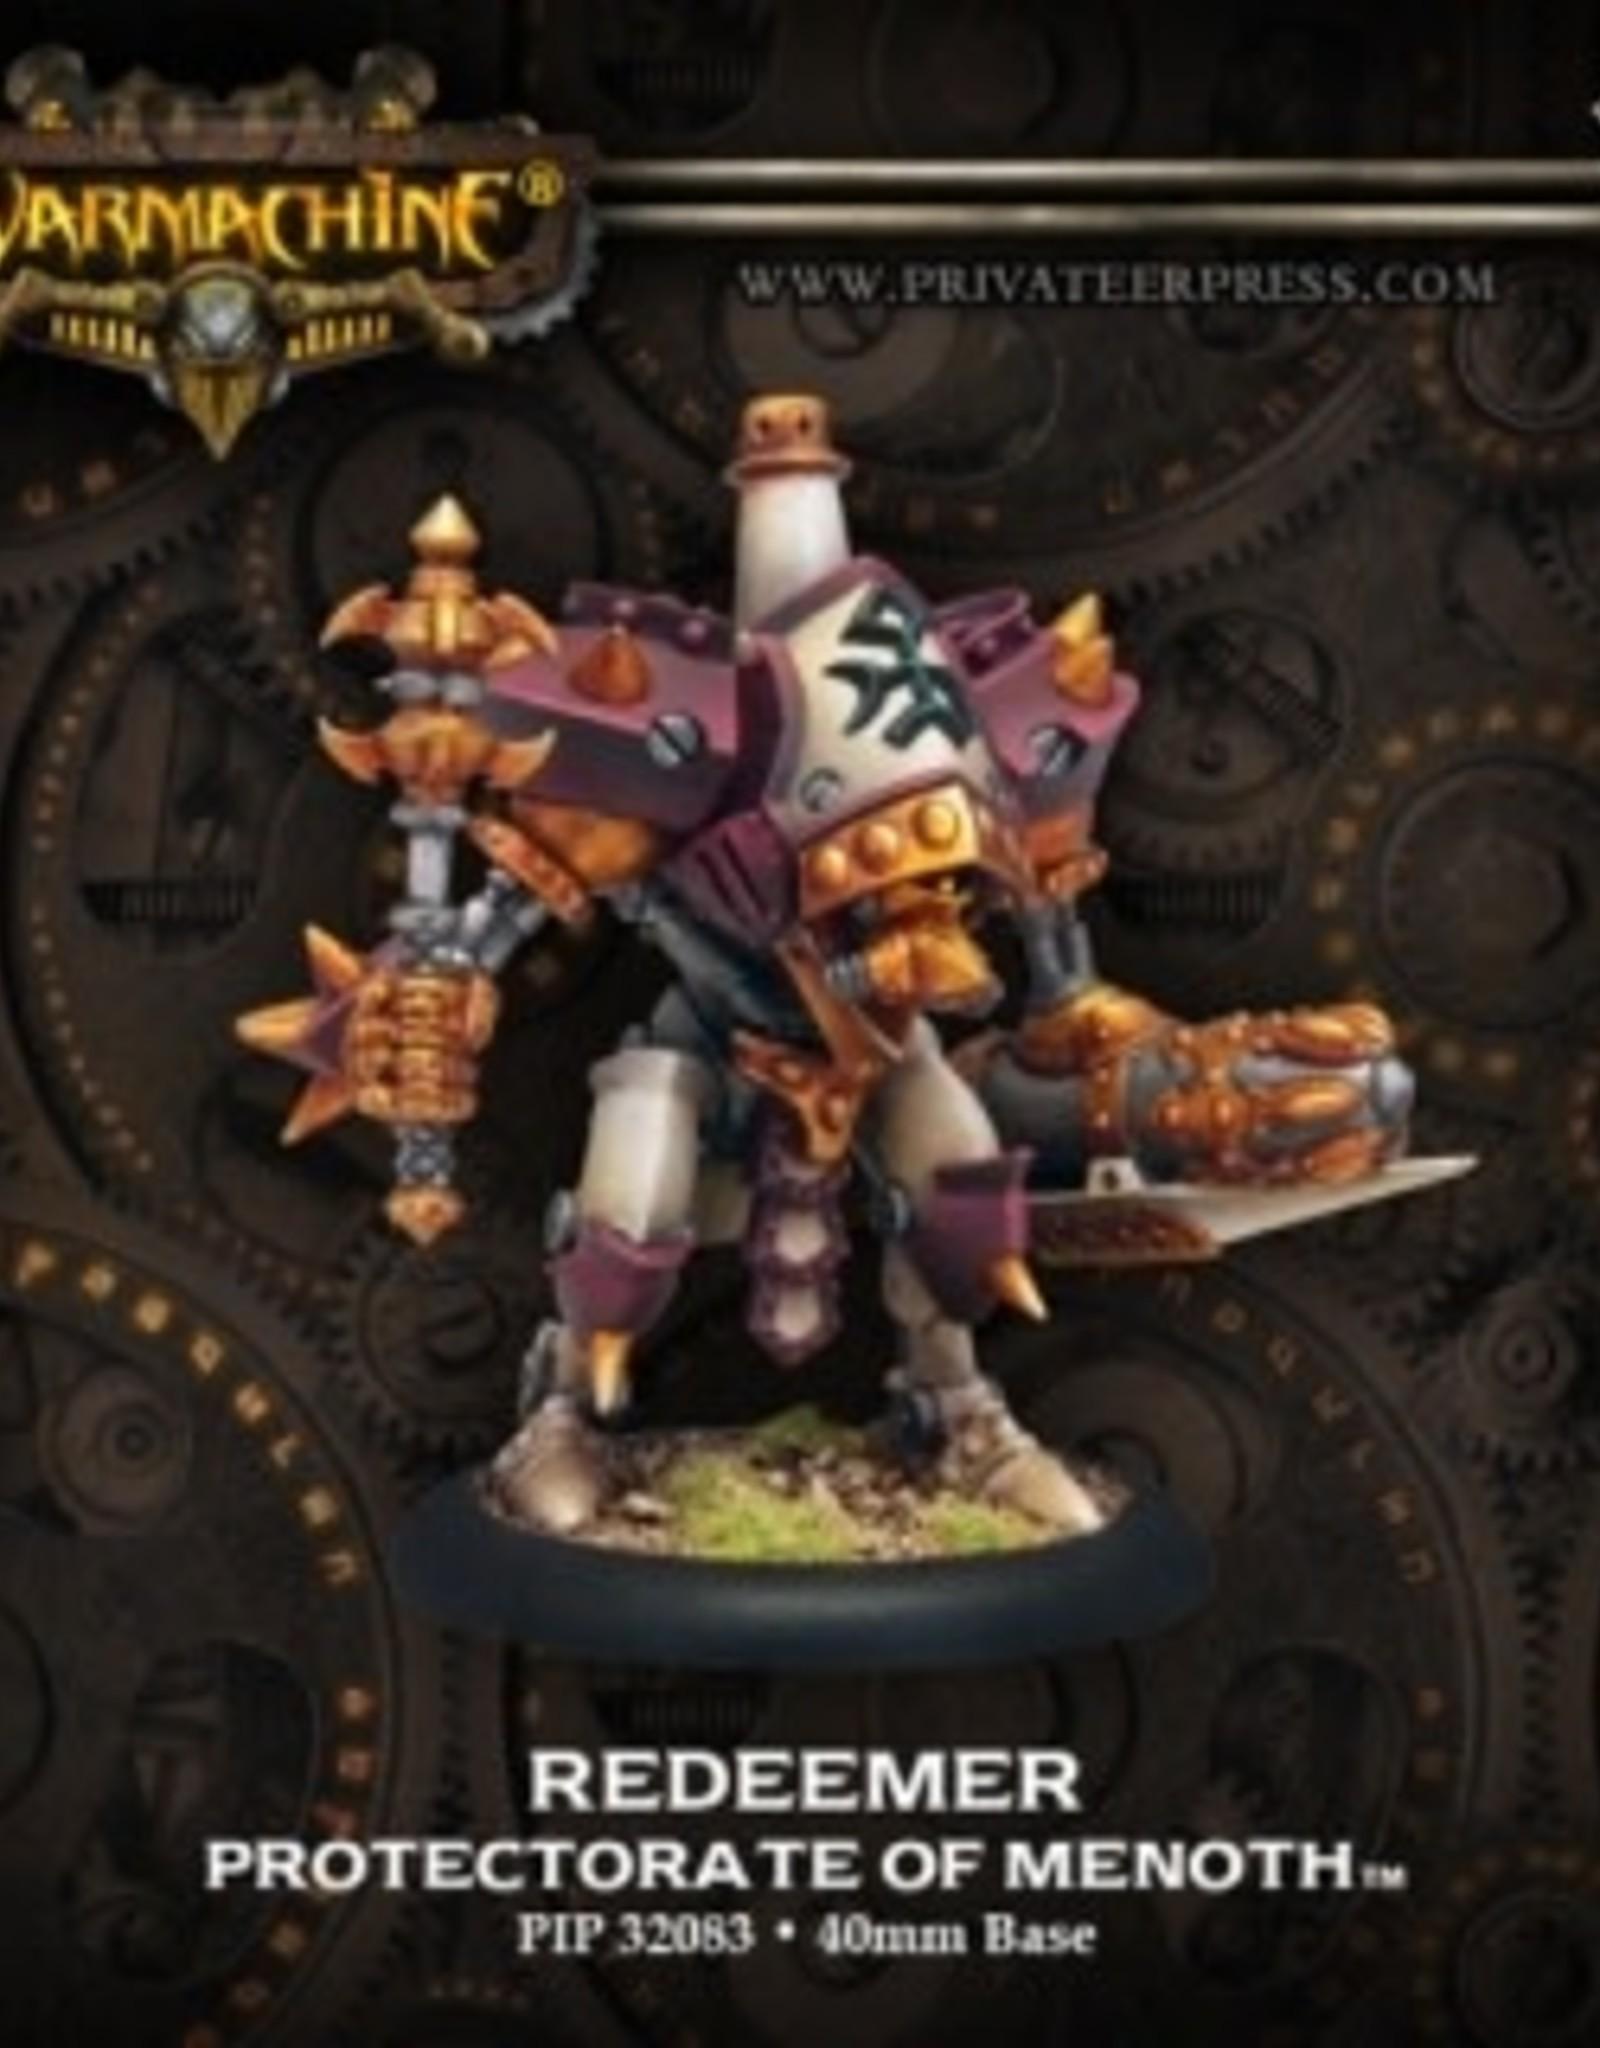 Warmachine Protectorate - Redeemer